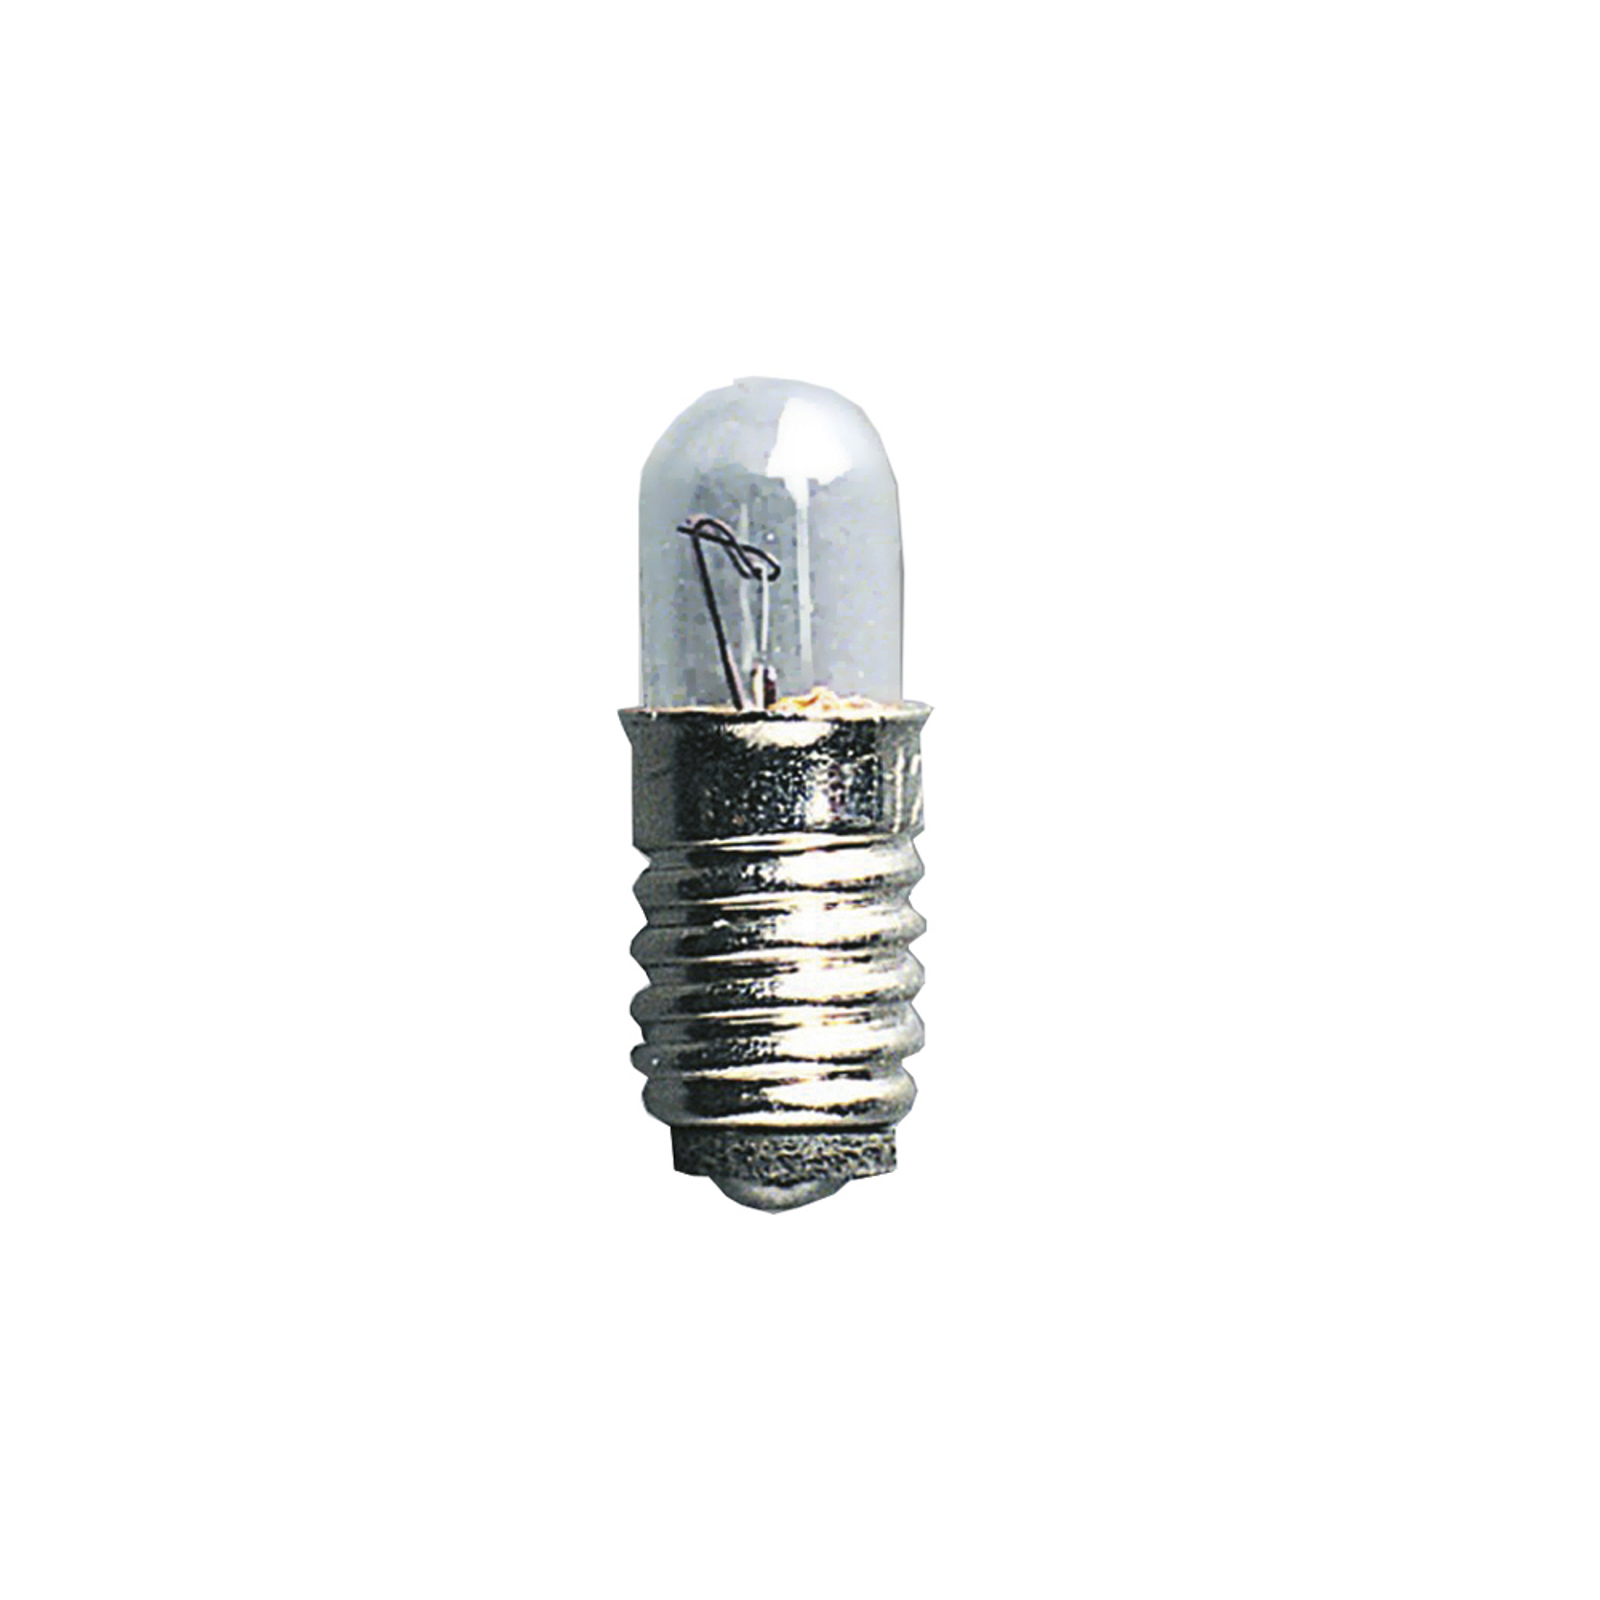 E5 0.6W 12V 5 bulbs for LV window candle, clear_1522094_1